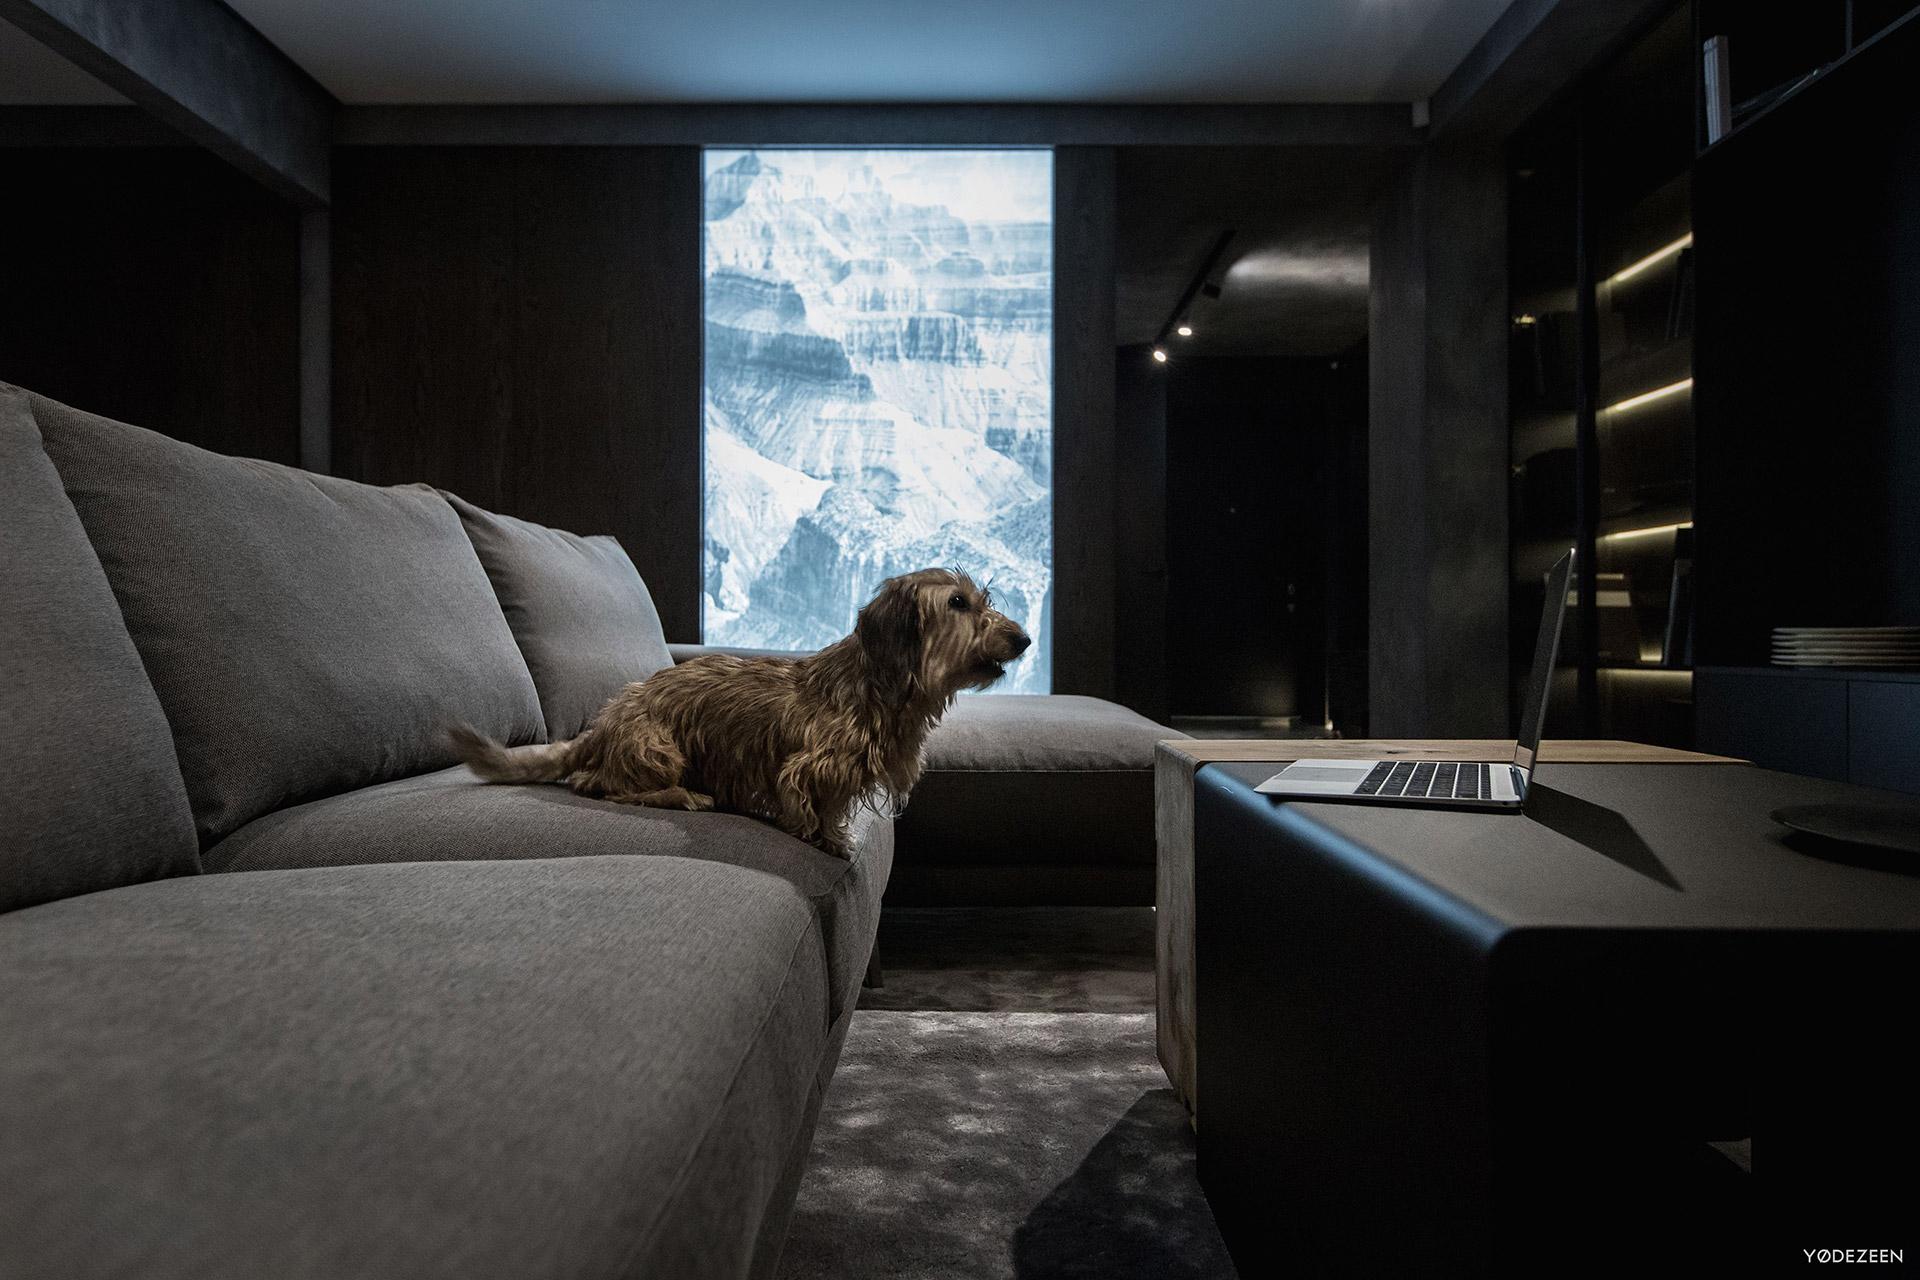 Grey sofa and a dog